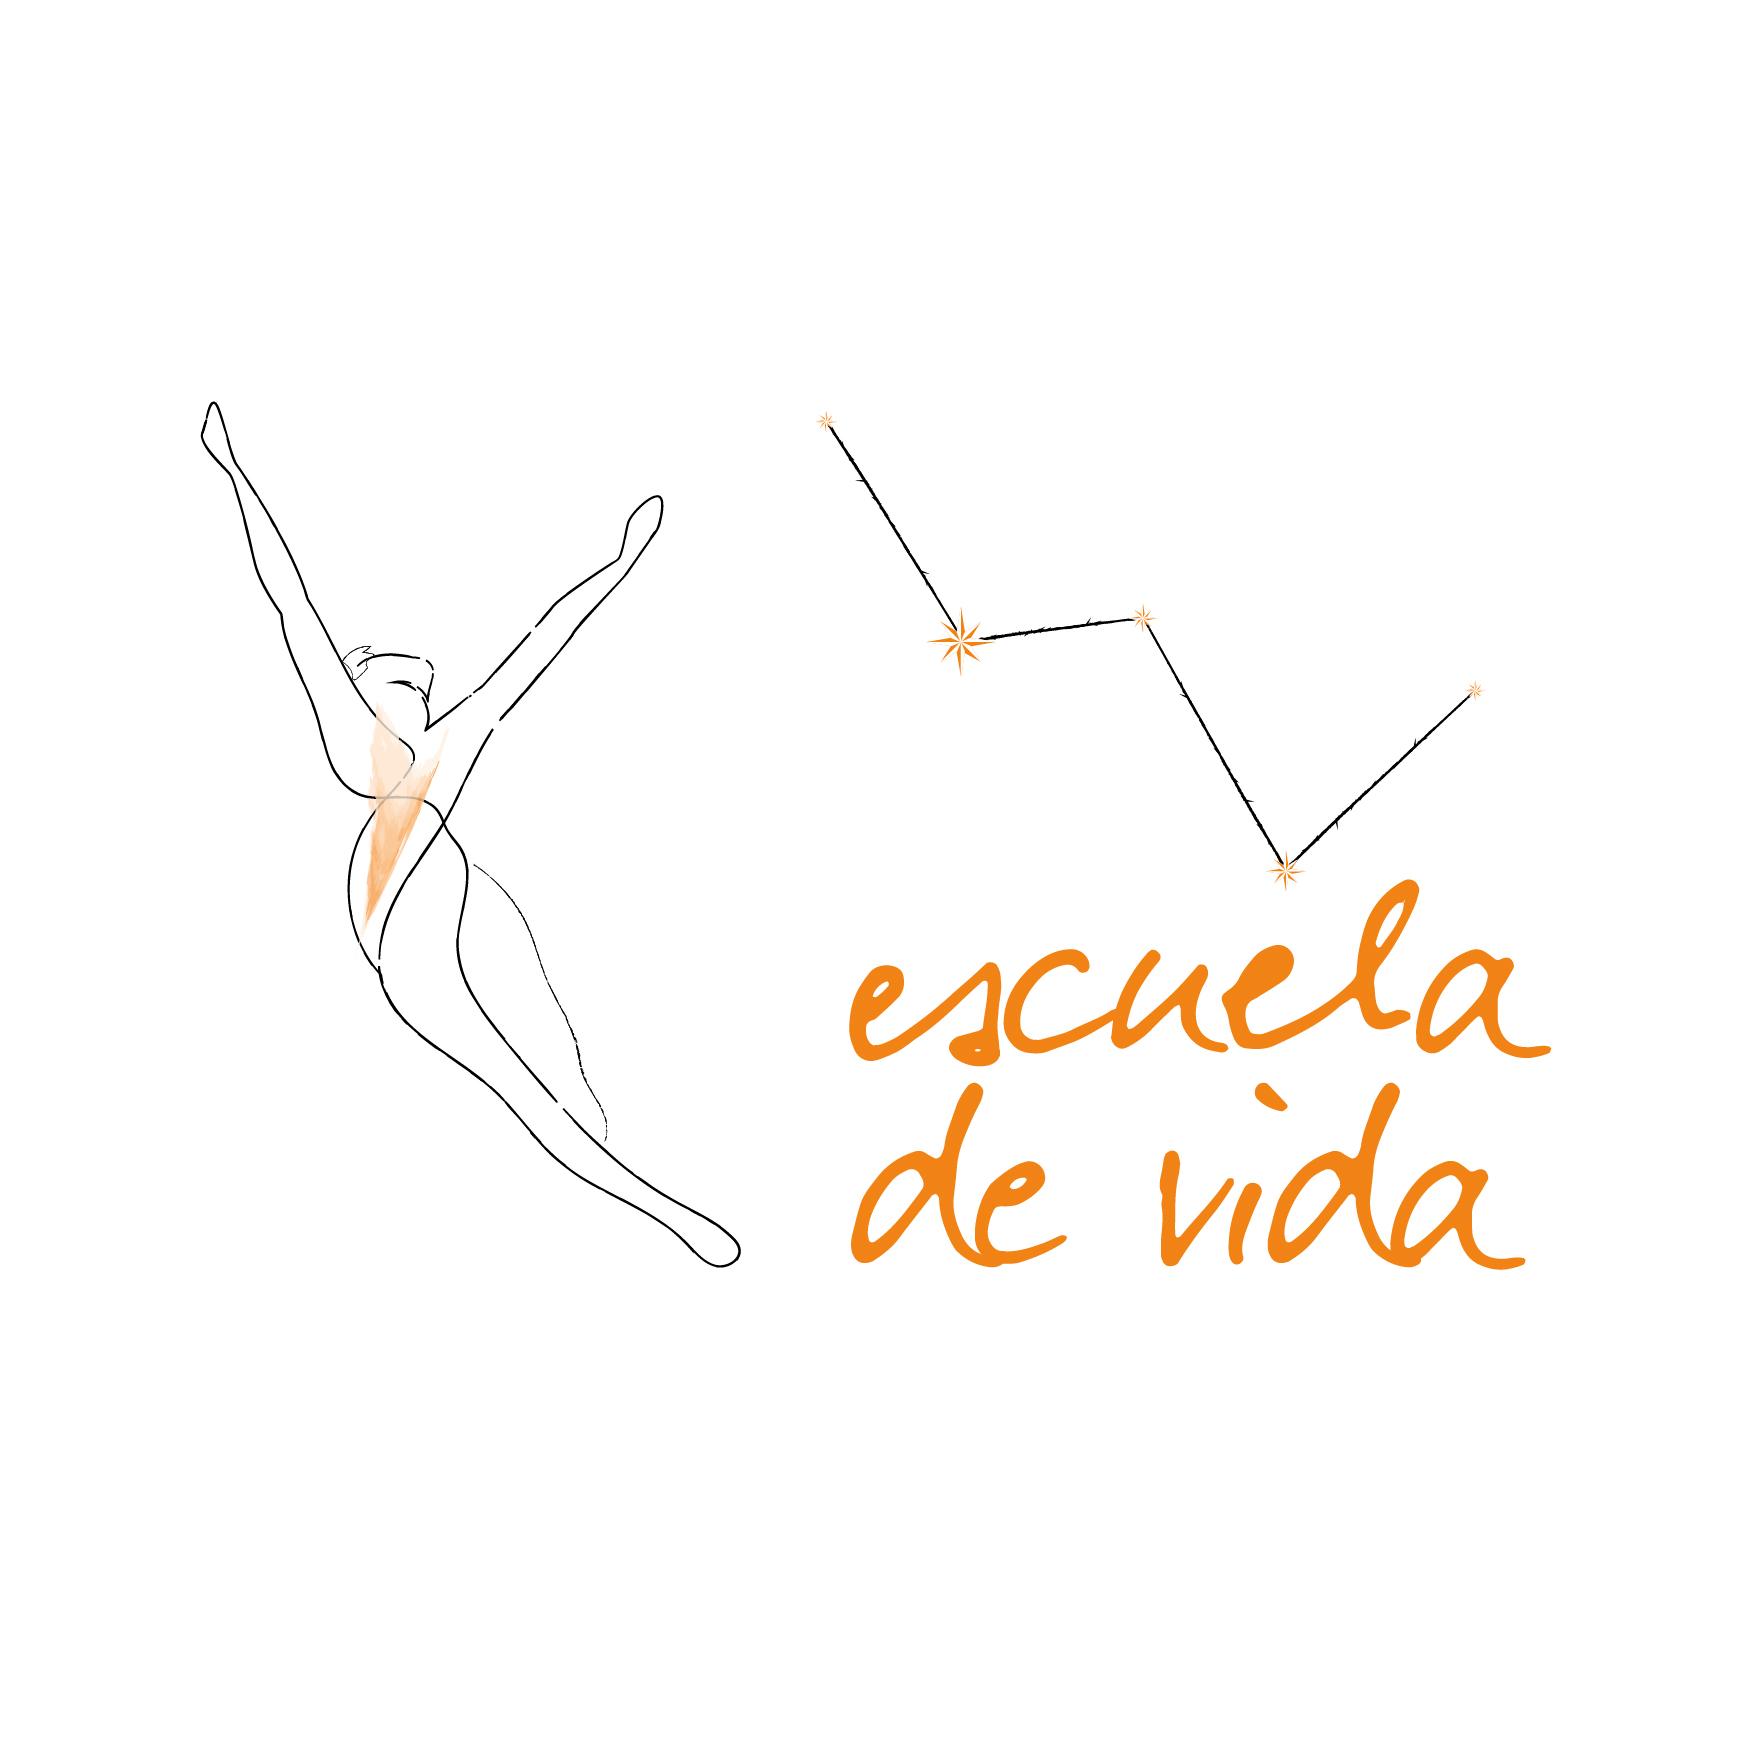 Branding-equanima-FORMATO-REDUCIDO-04.jpg